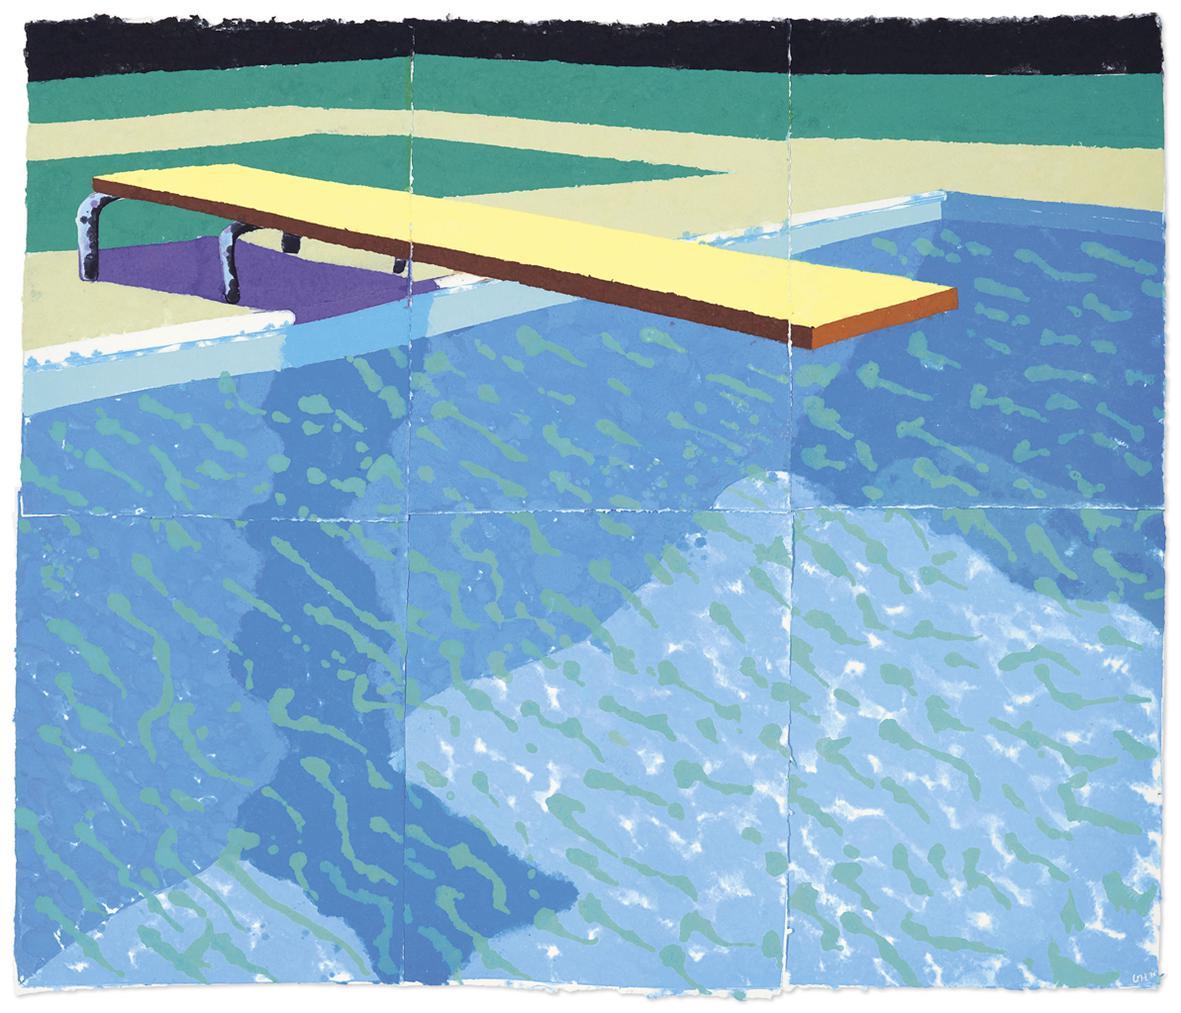 David Hockney-Sprungbrett Mit Schatten (Paper Pool 14)-1978